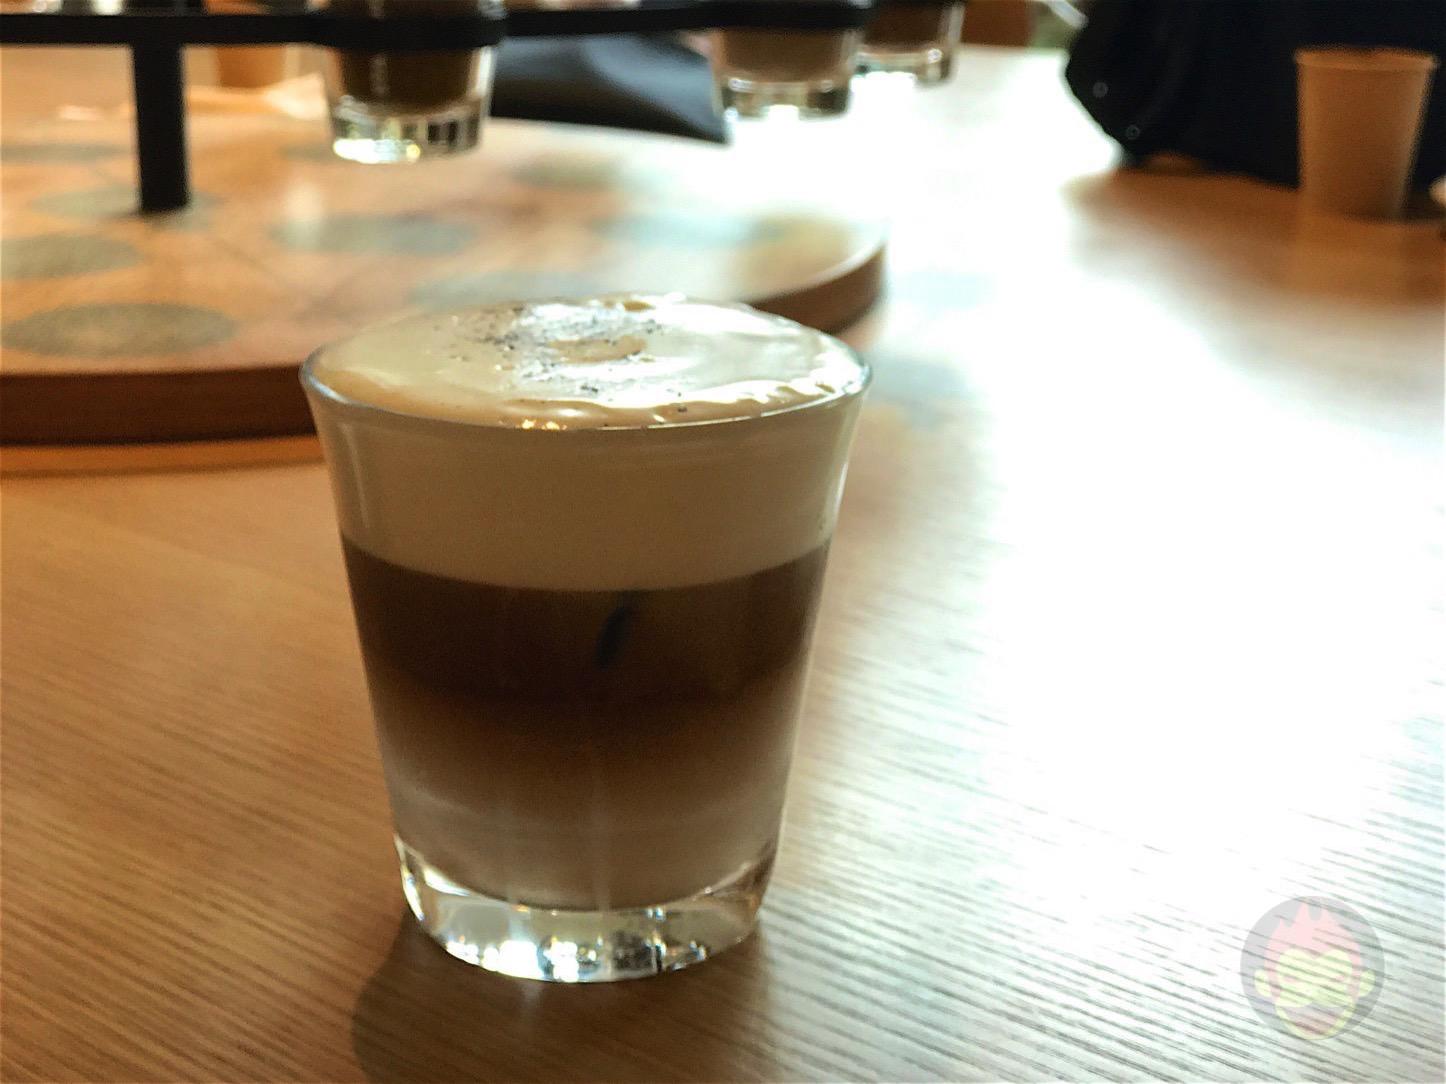 Starbucks-Neighborhood-and-Coffee-01.jpg